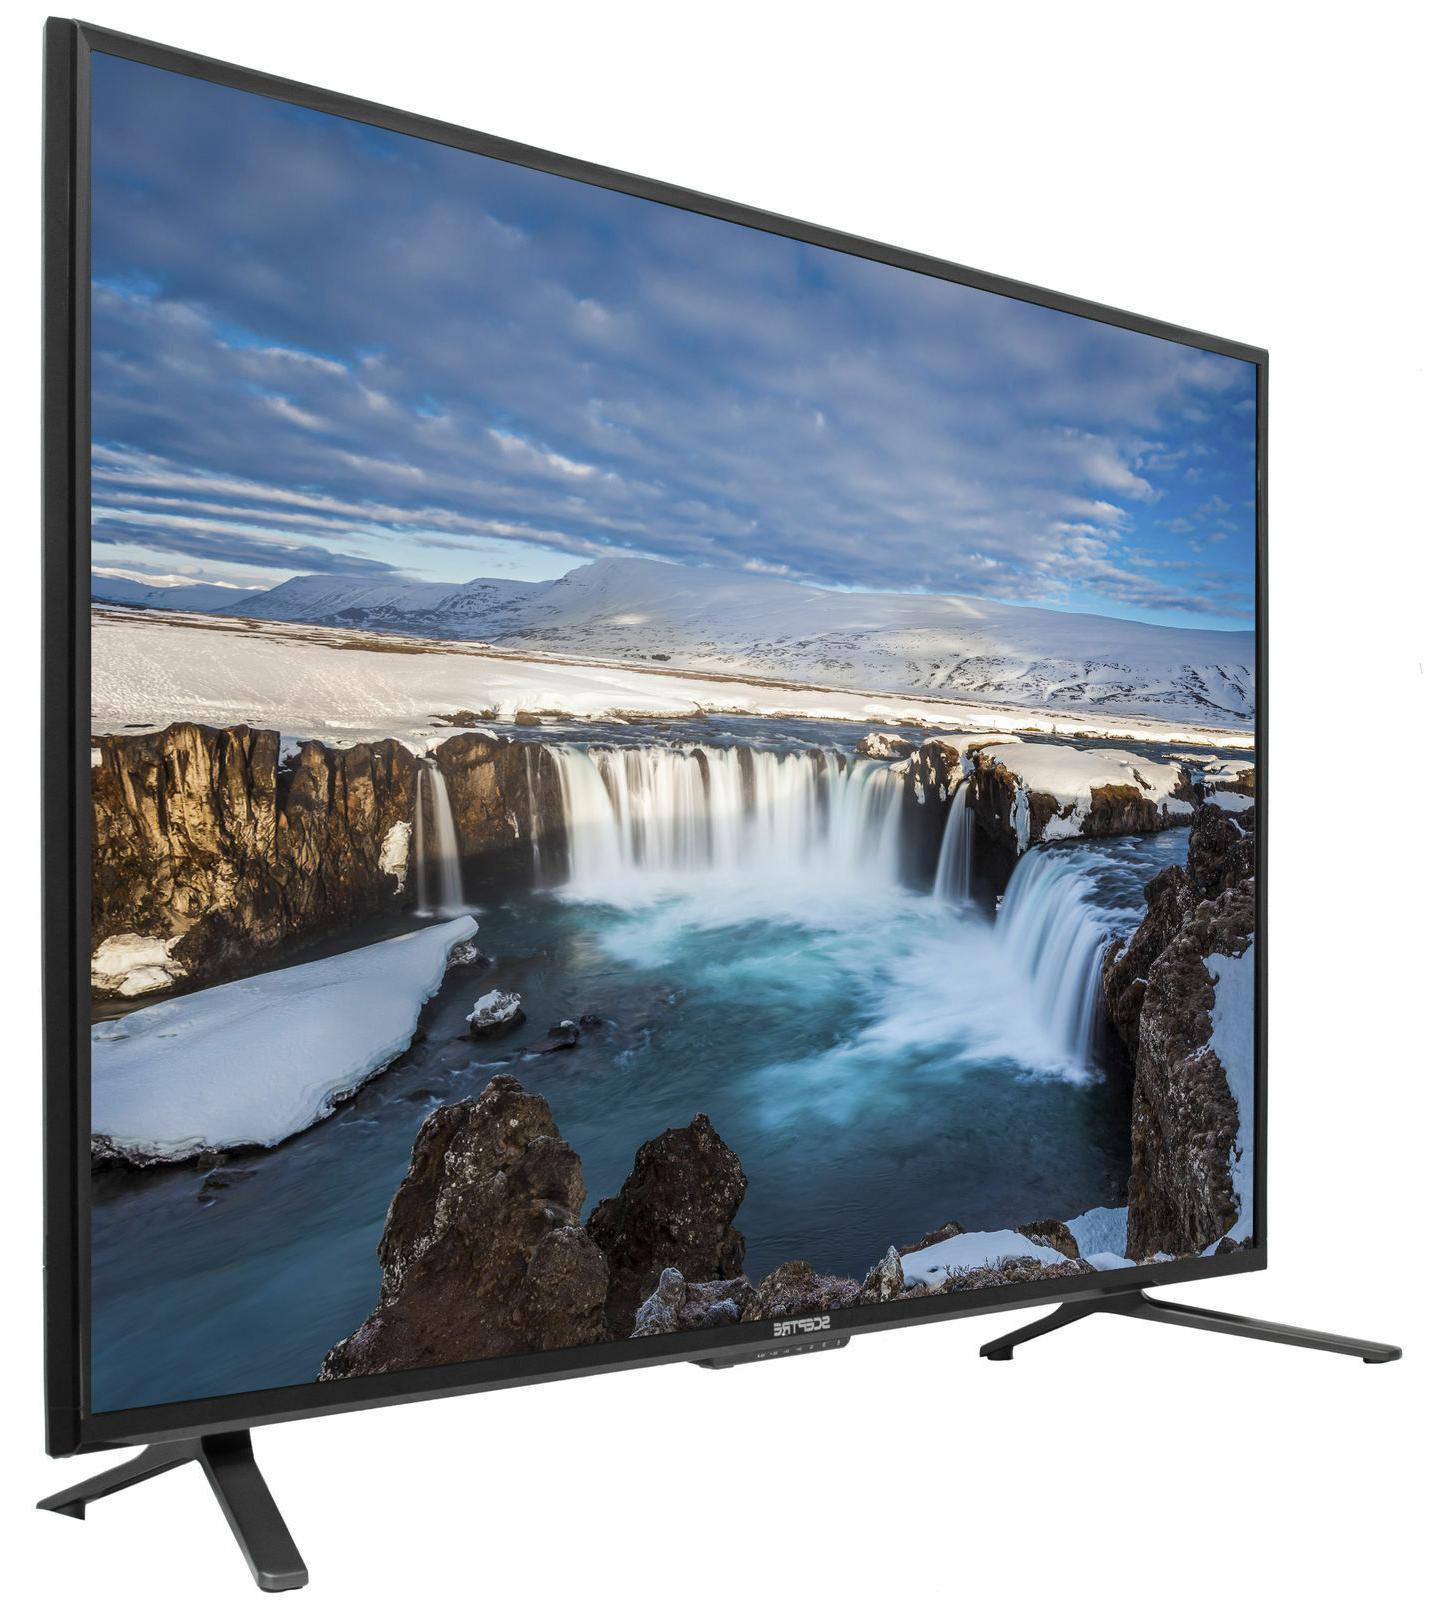 HD LED TV Flat Screen 60 Bedroom